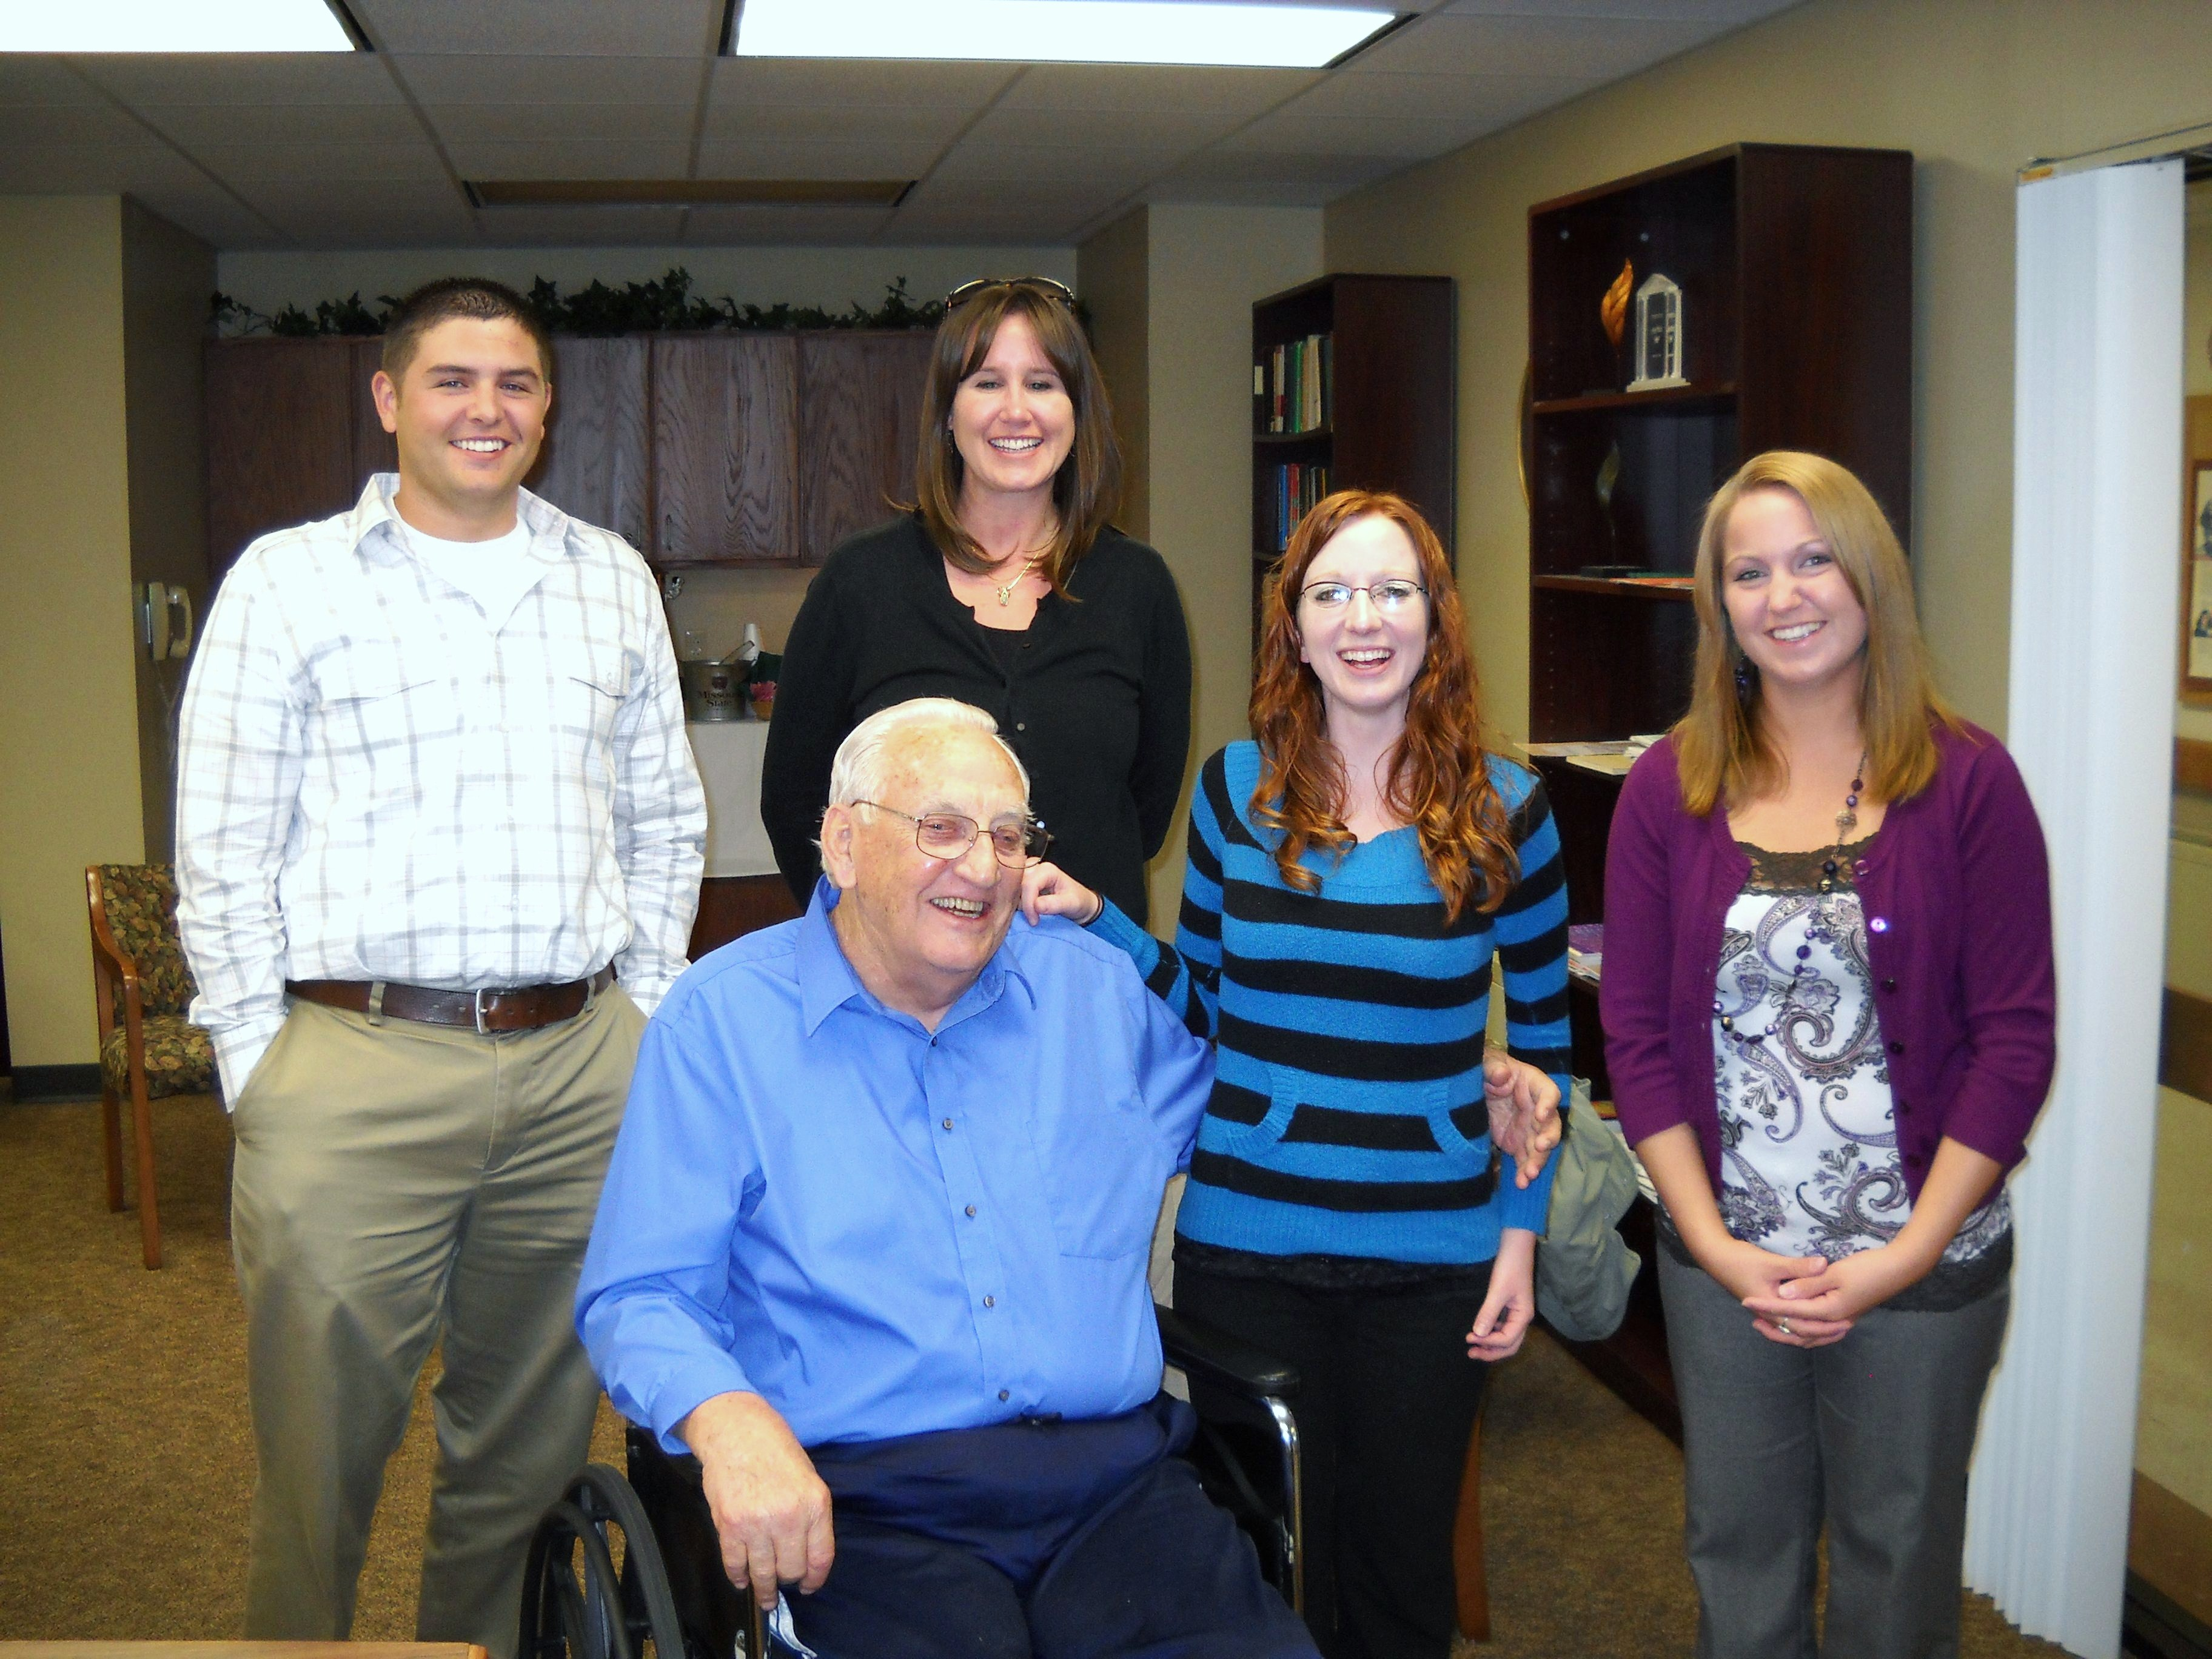 MTH Students awarded Dr. Joe Crosswhite Scholarship